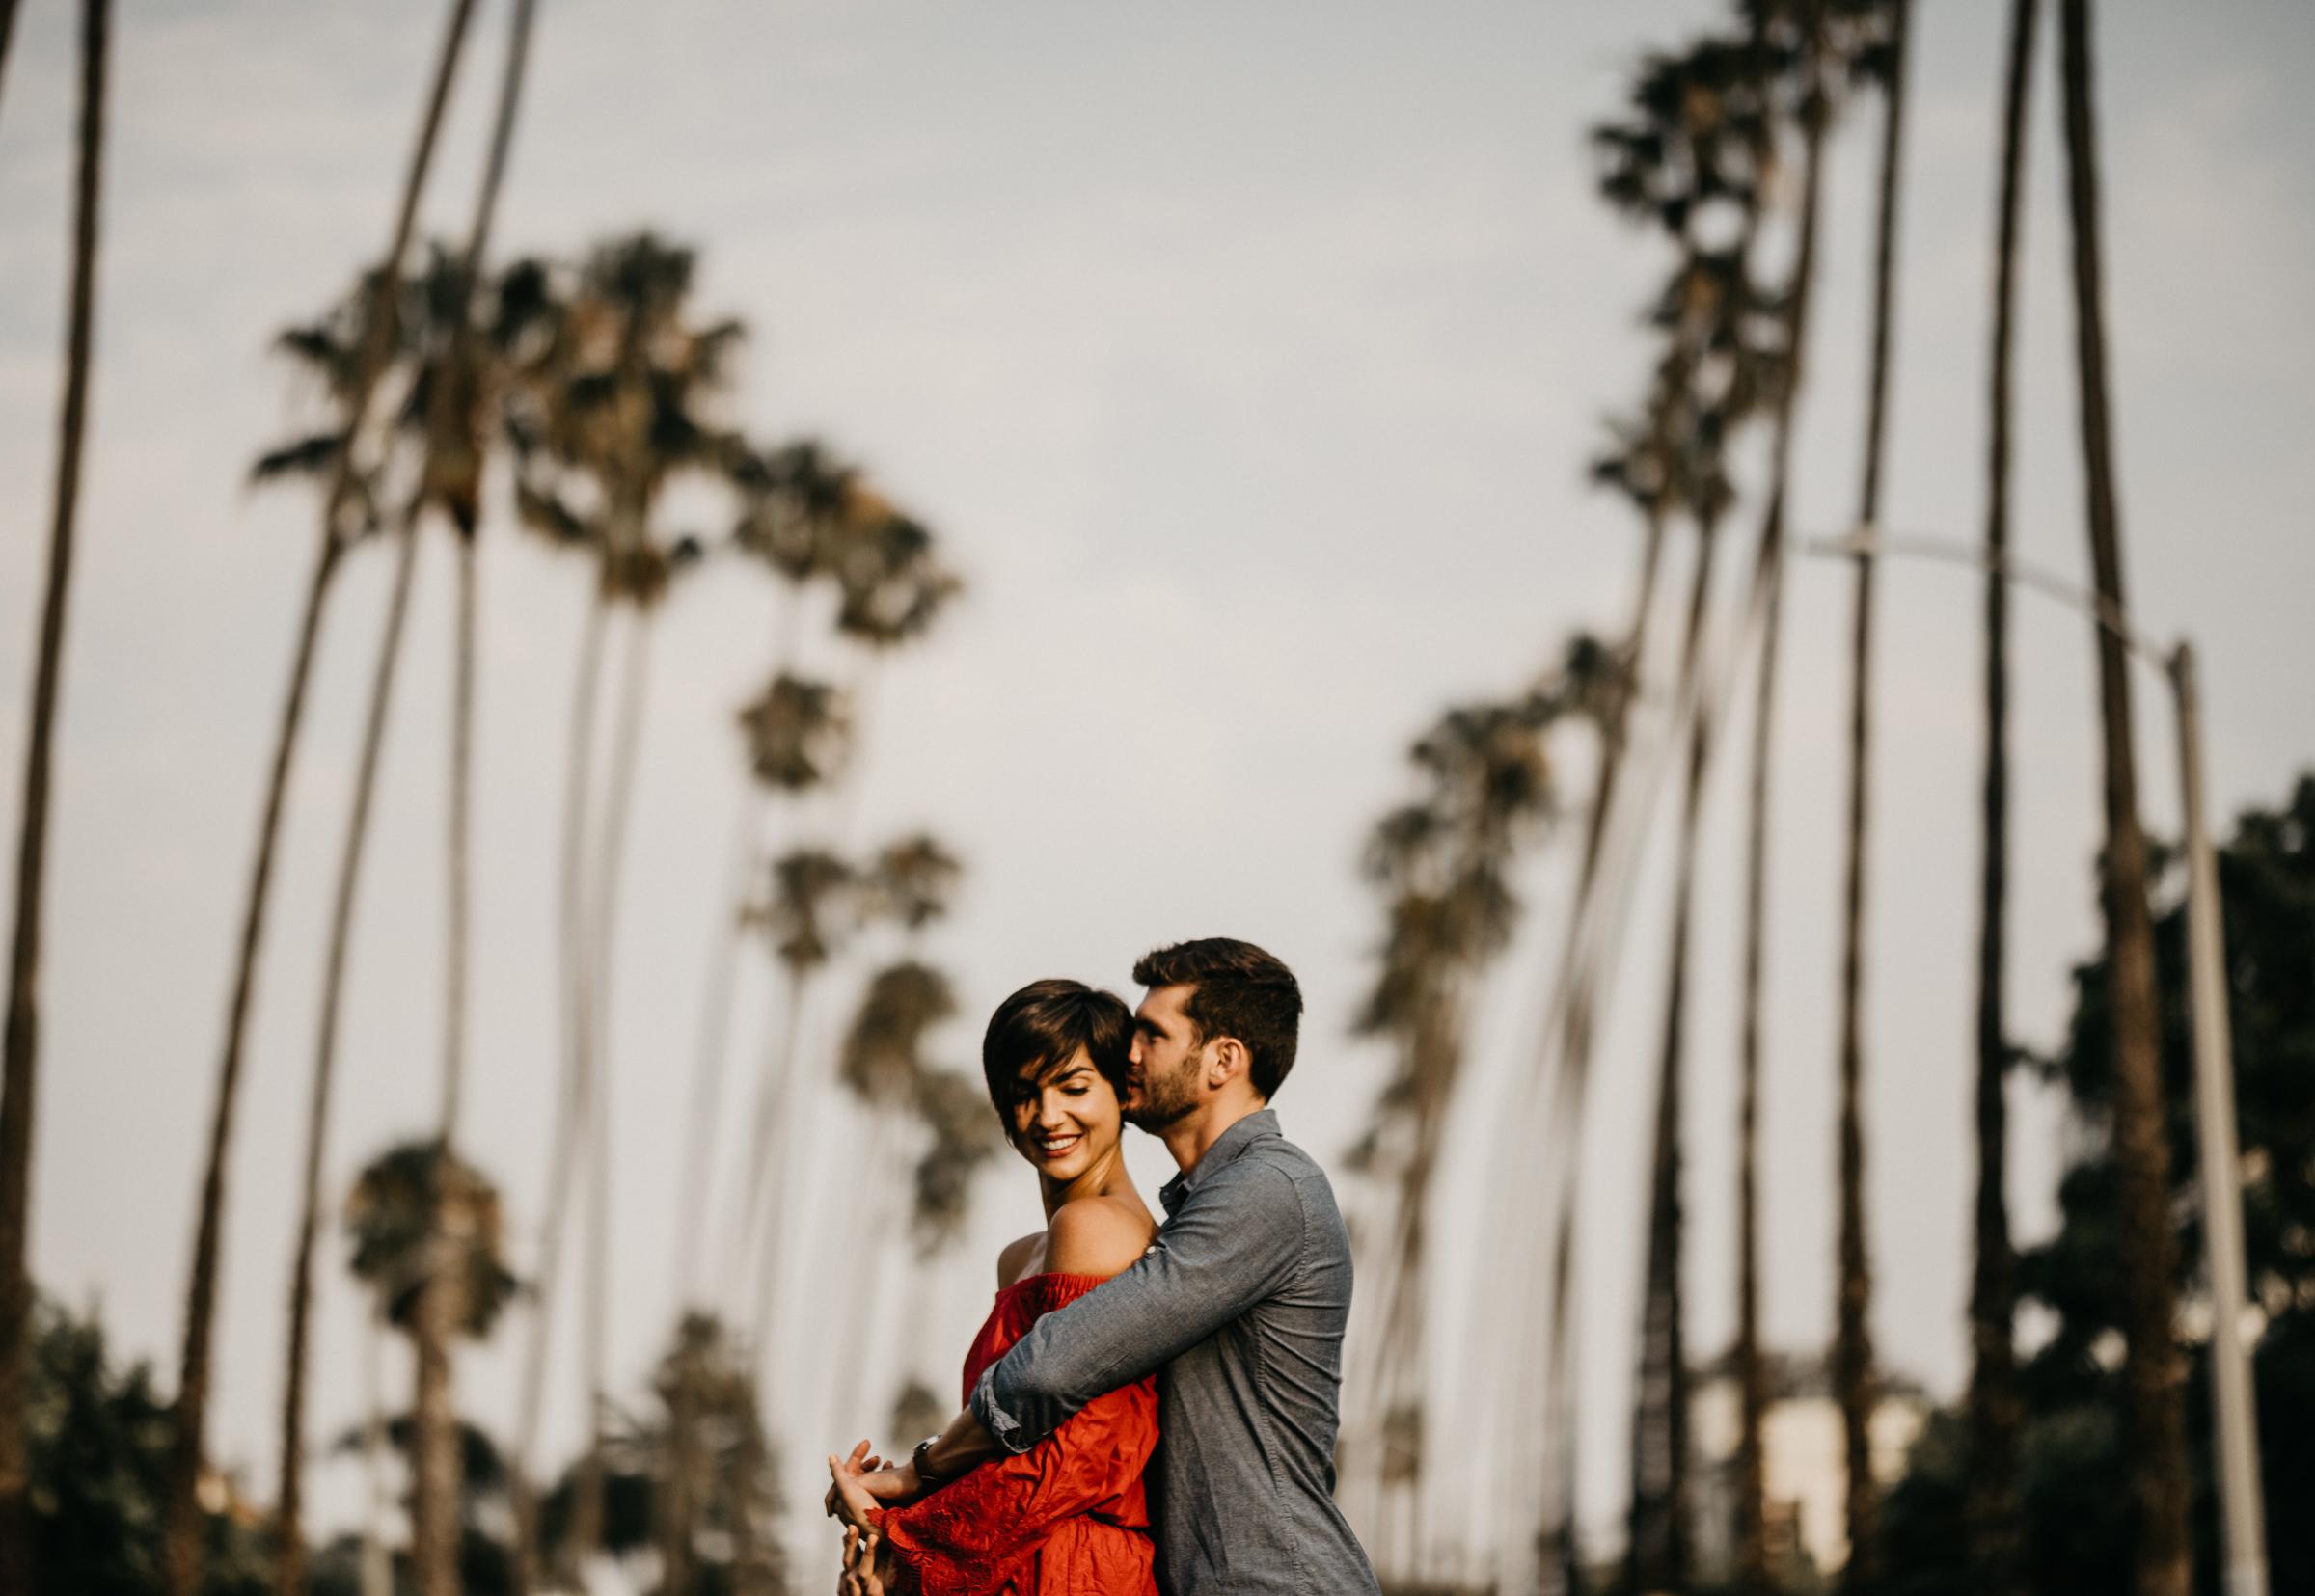 Isaiah + Taylor Photography - Santa Monica Engagement Session, Los Angeles Wedding Photographer-007.jpg